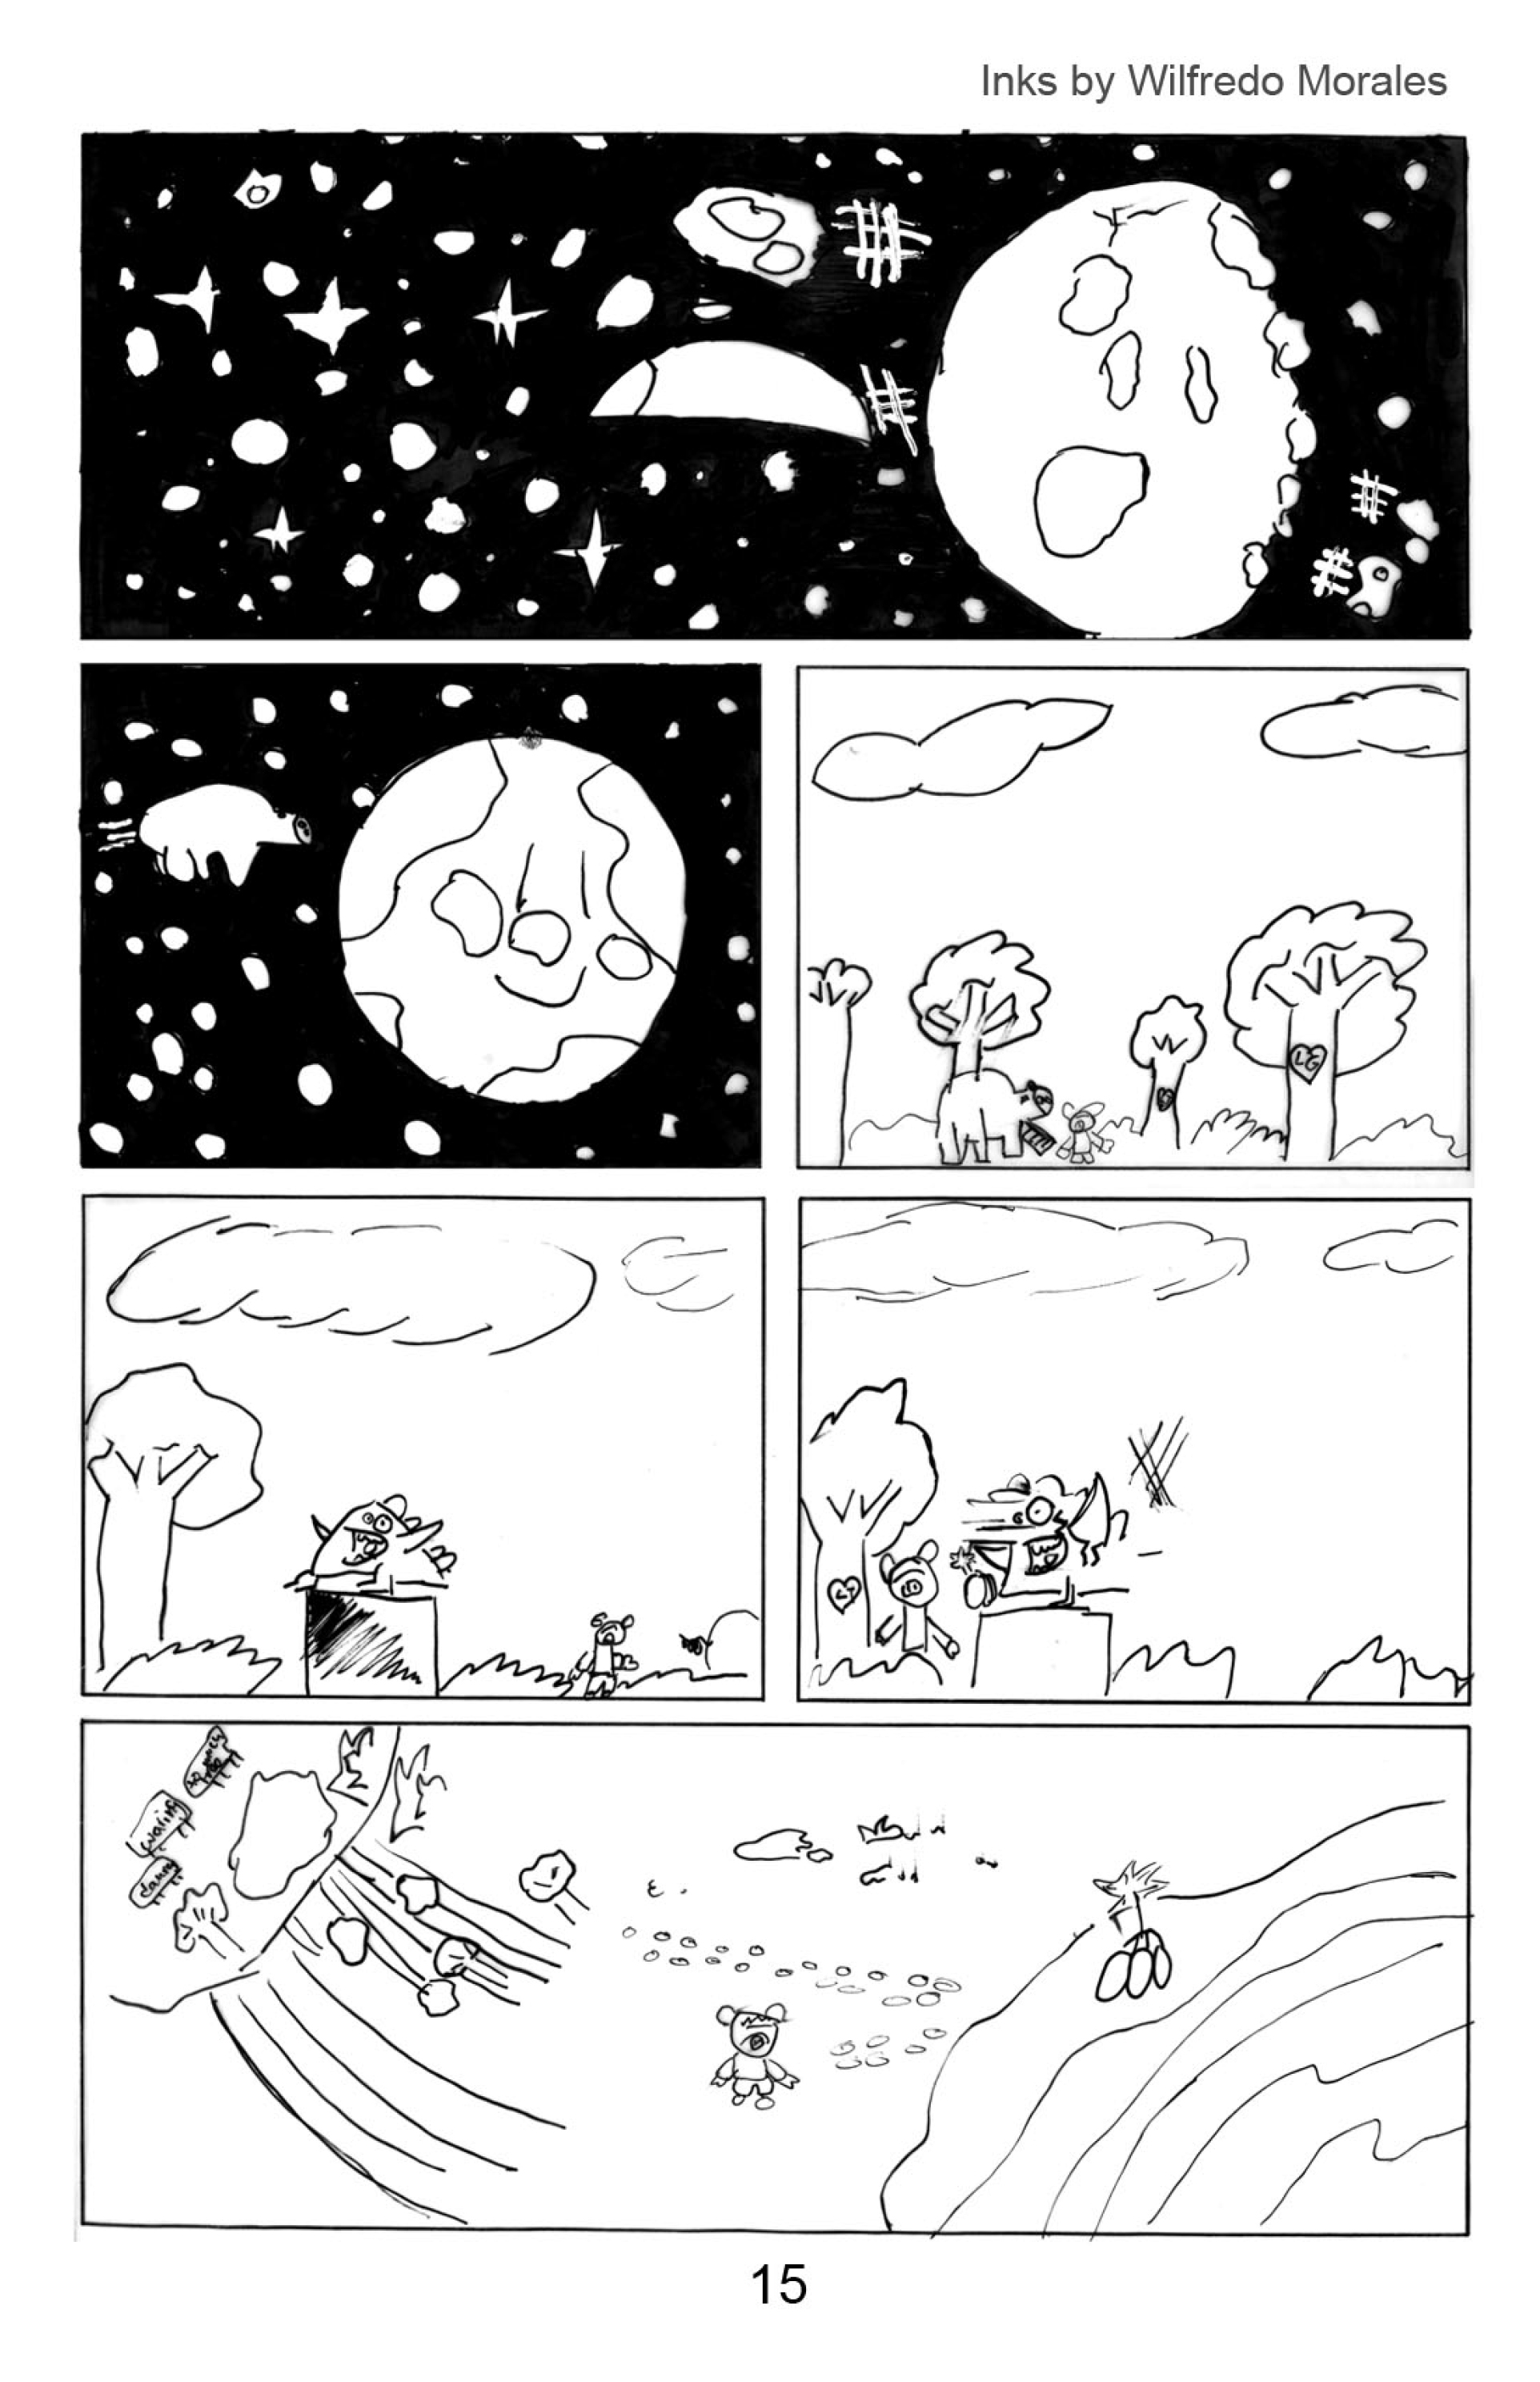 ev page 15.jpg